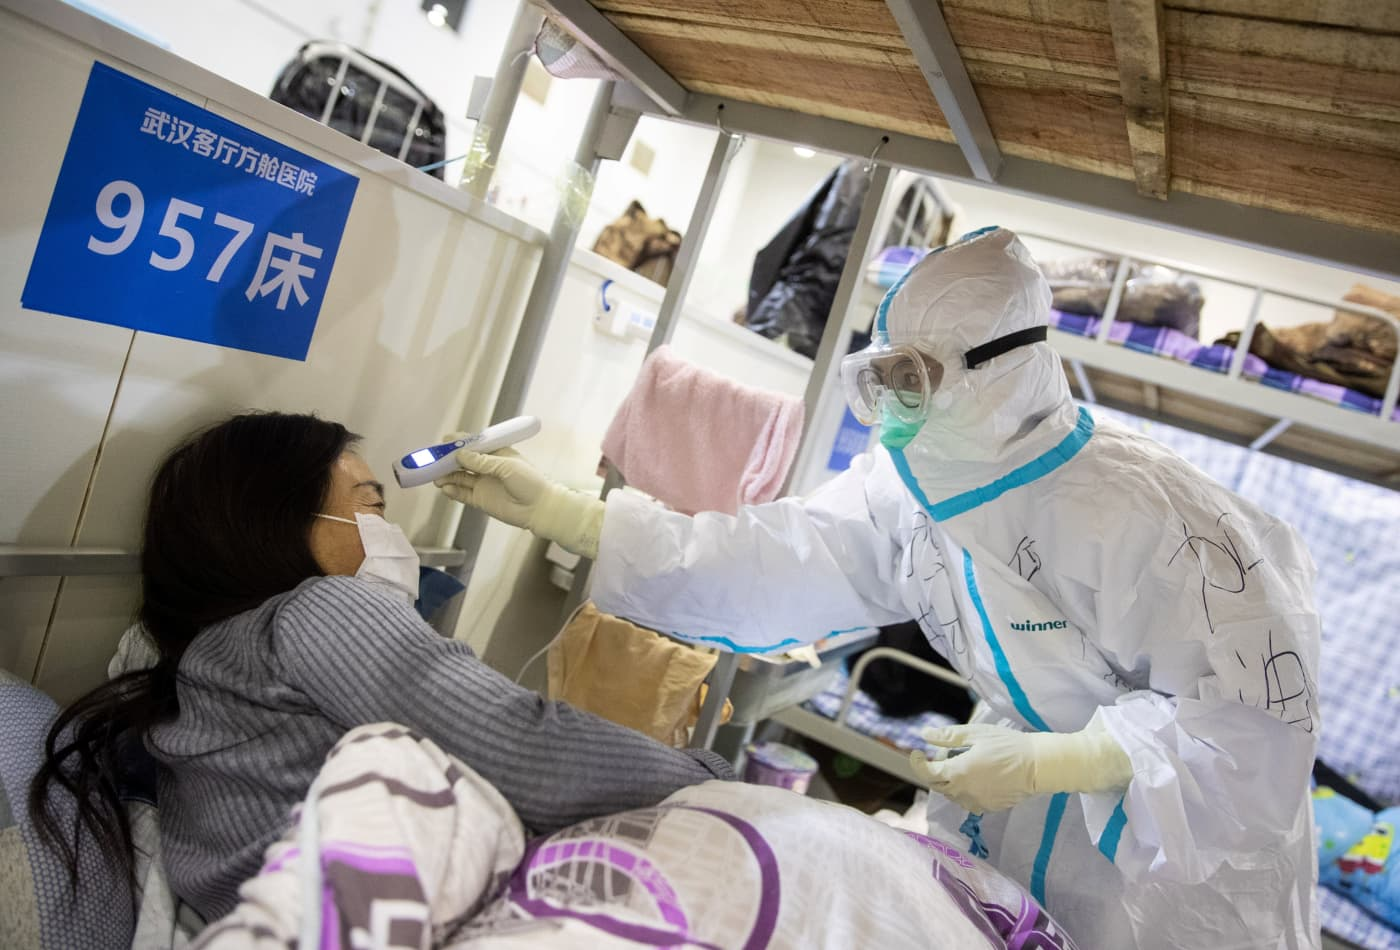 Coronavirus live updates: Sanofi working on vaccine with US health agency, Jaguar faces parts shortage